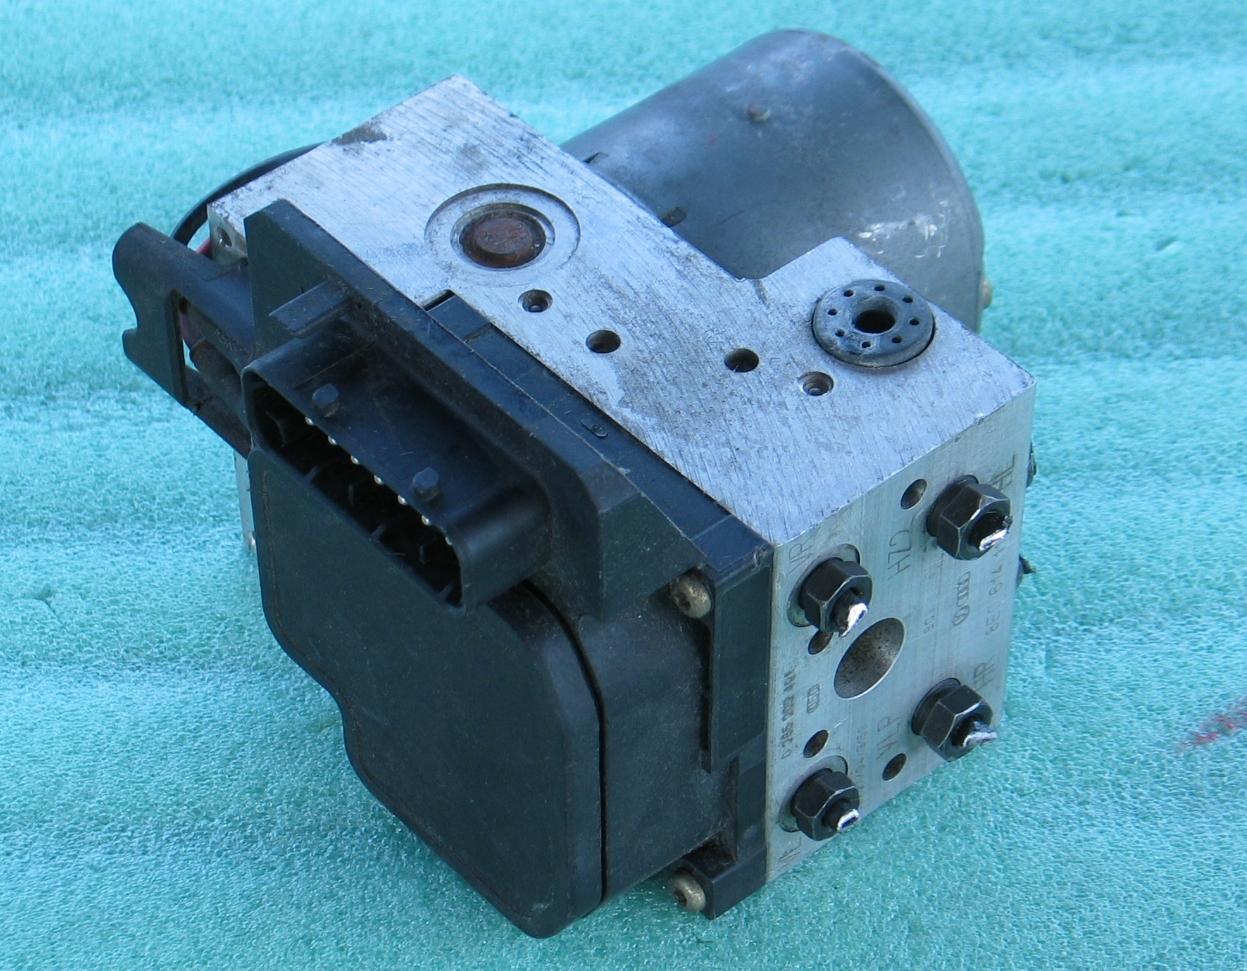 ABS Unit 8E0-614-111-T Bosch 0265202401 VW Pat Audi A4 A6 A8